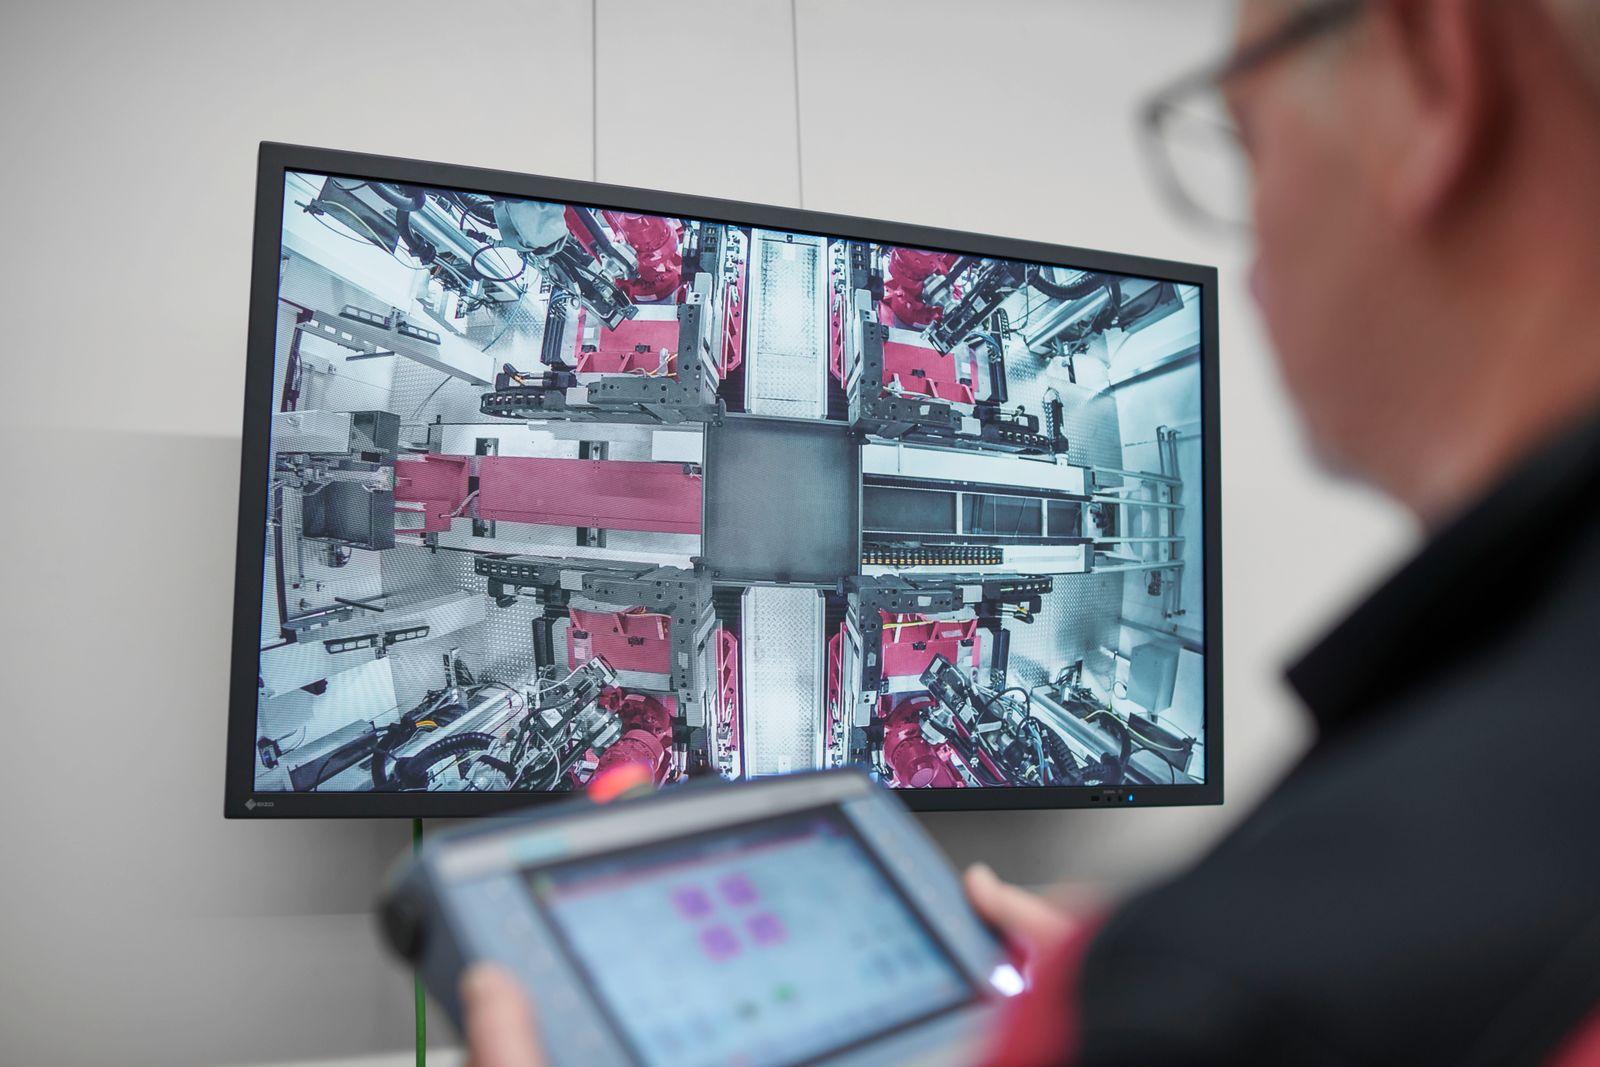 Rittal / Smart Factory / Industrie 4.0